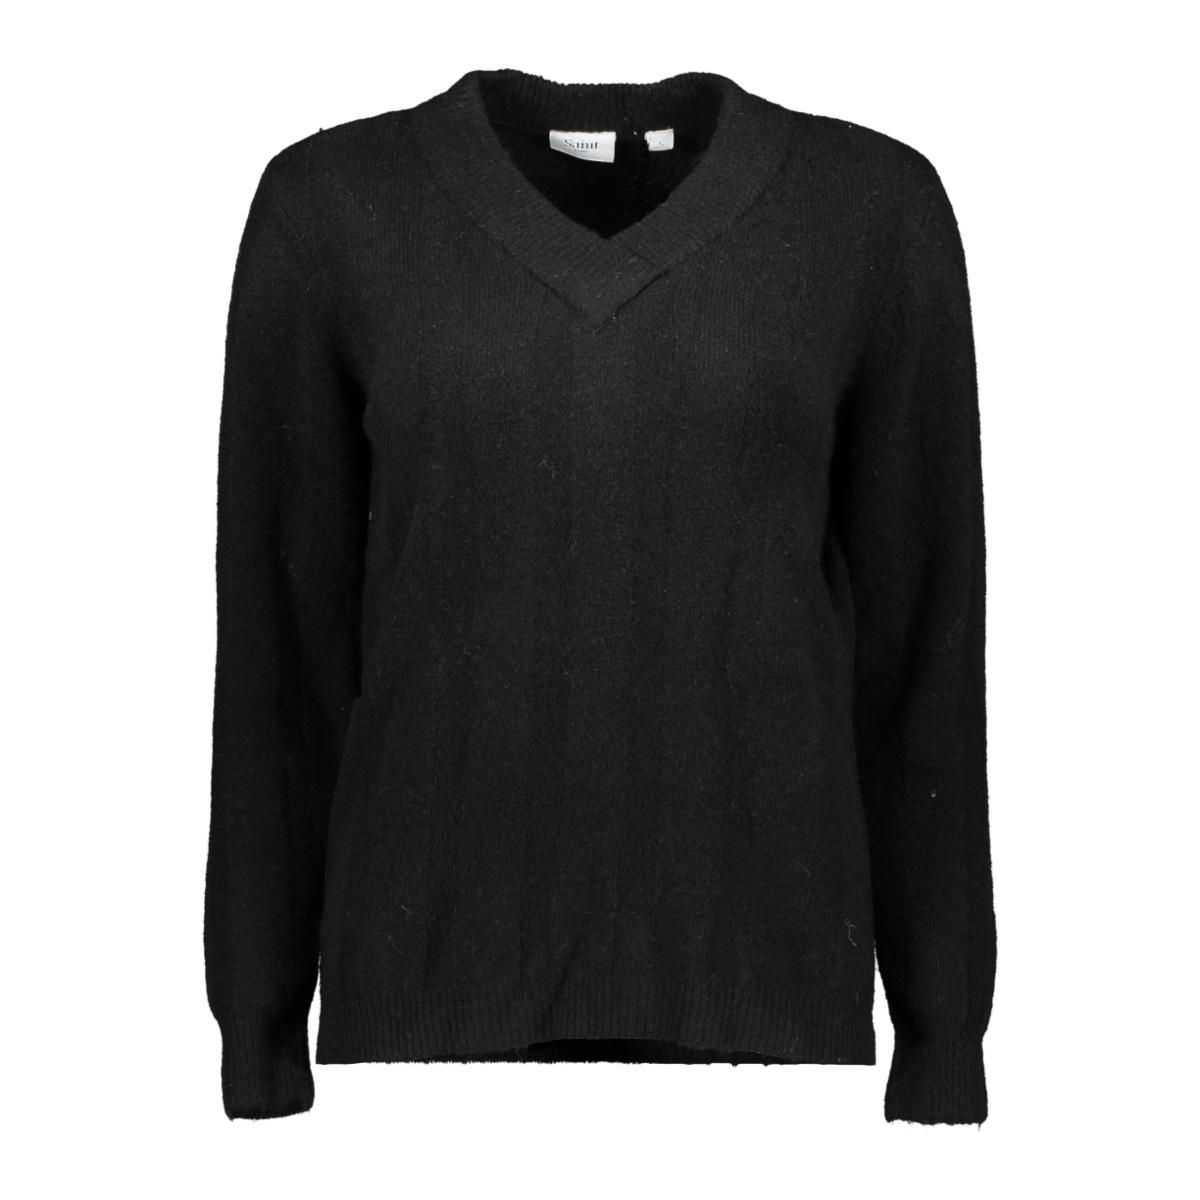 knit pullover v neck l s 30501476 saint tropez trui 0001